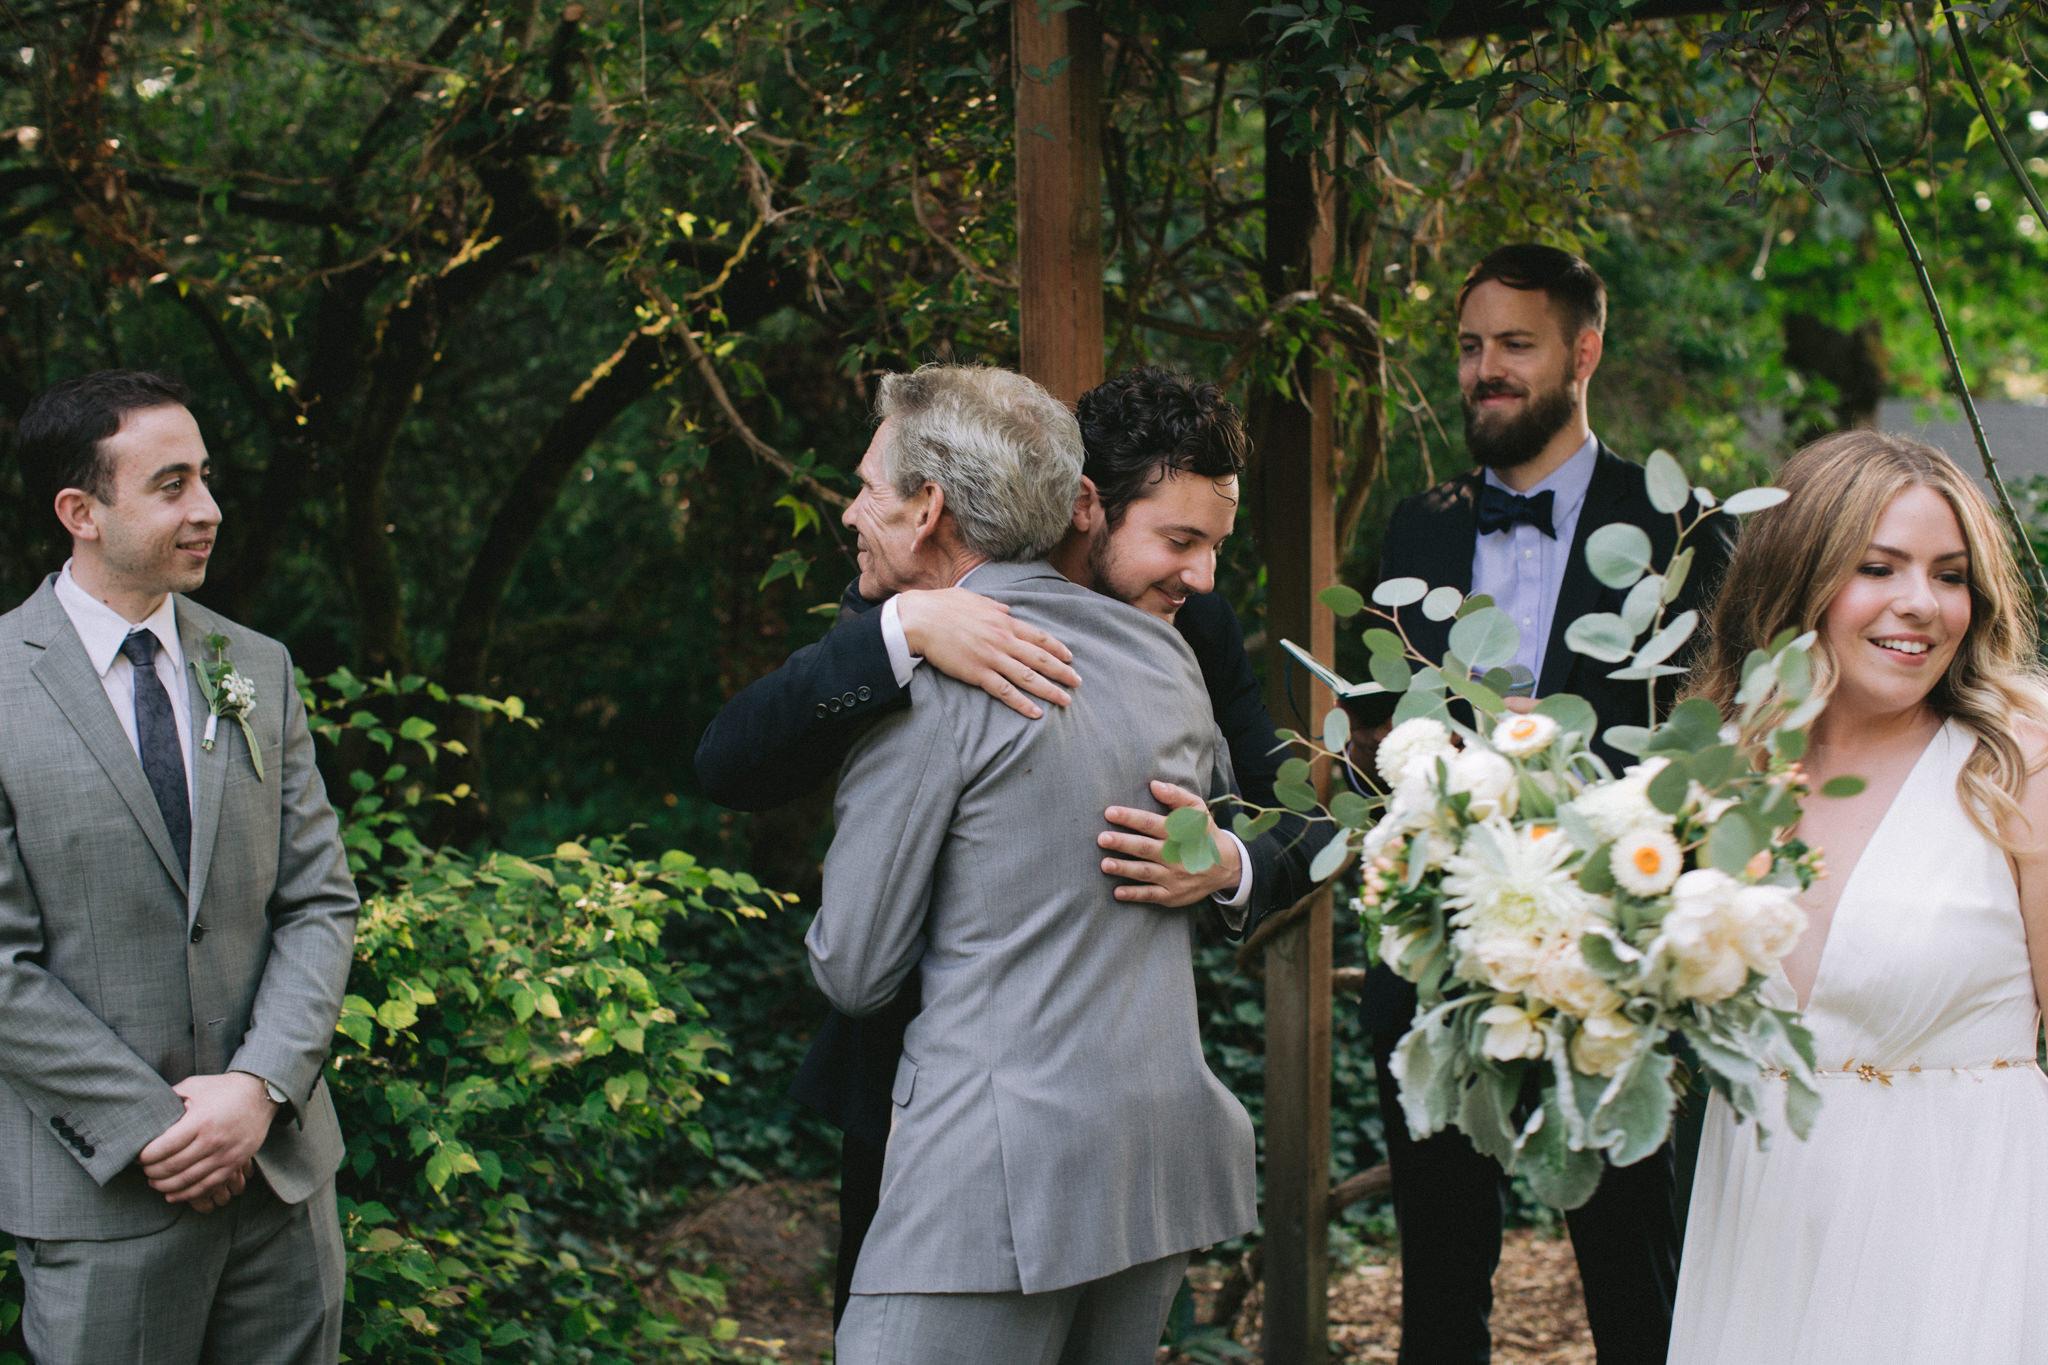 Backyard-Bainbridge-Island-Wedding-Alycia-Lovell-Photography-91.JPG